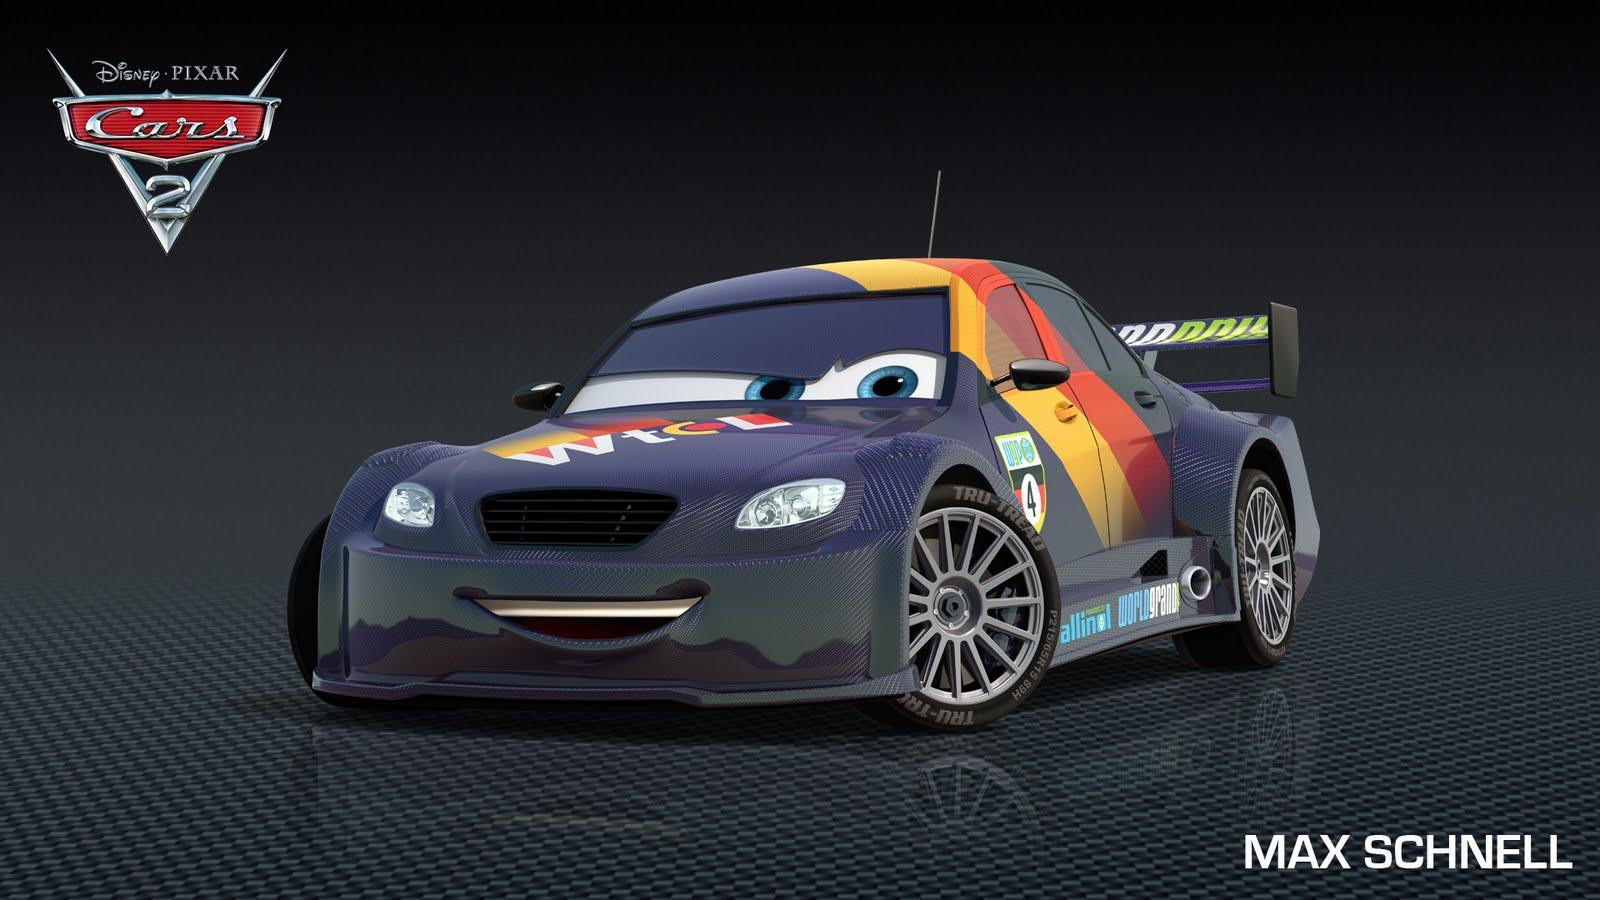 Max schnell cars 2 pixar wiki disney pixar animation studios